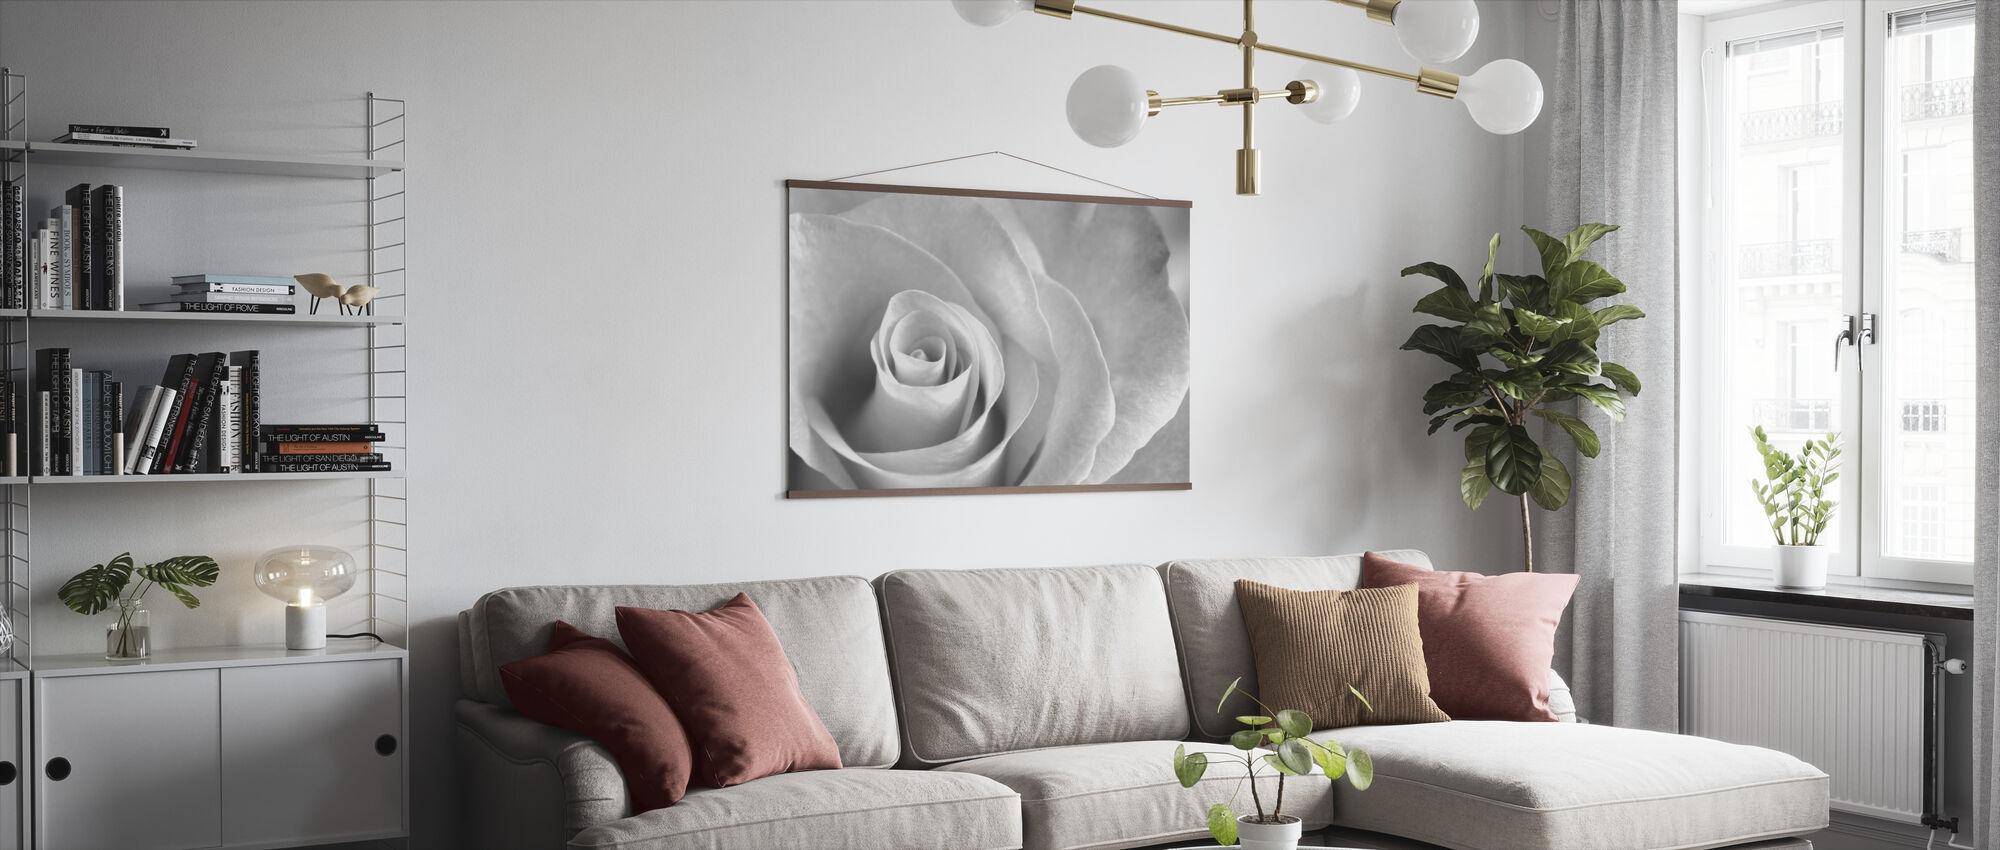 Soft Rose - b/w - Poster - Living Room